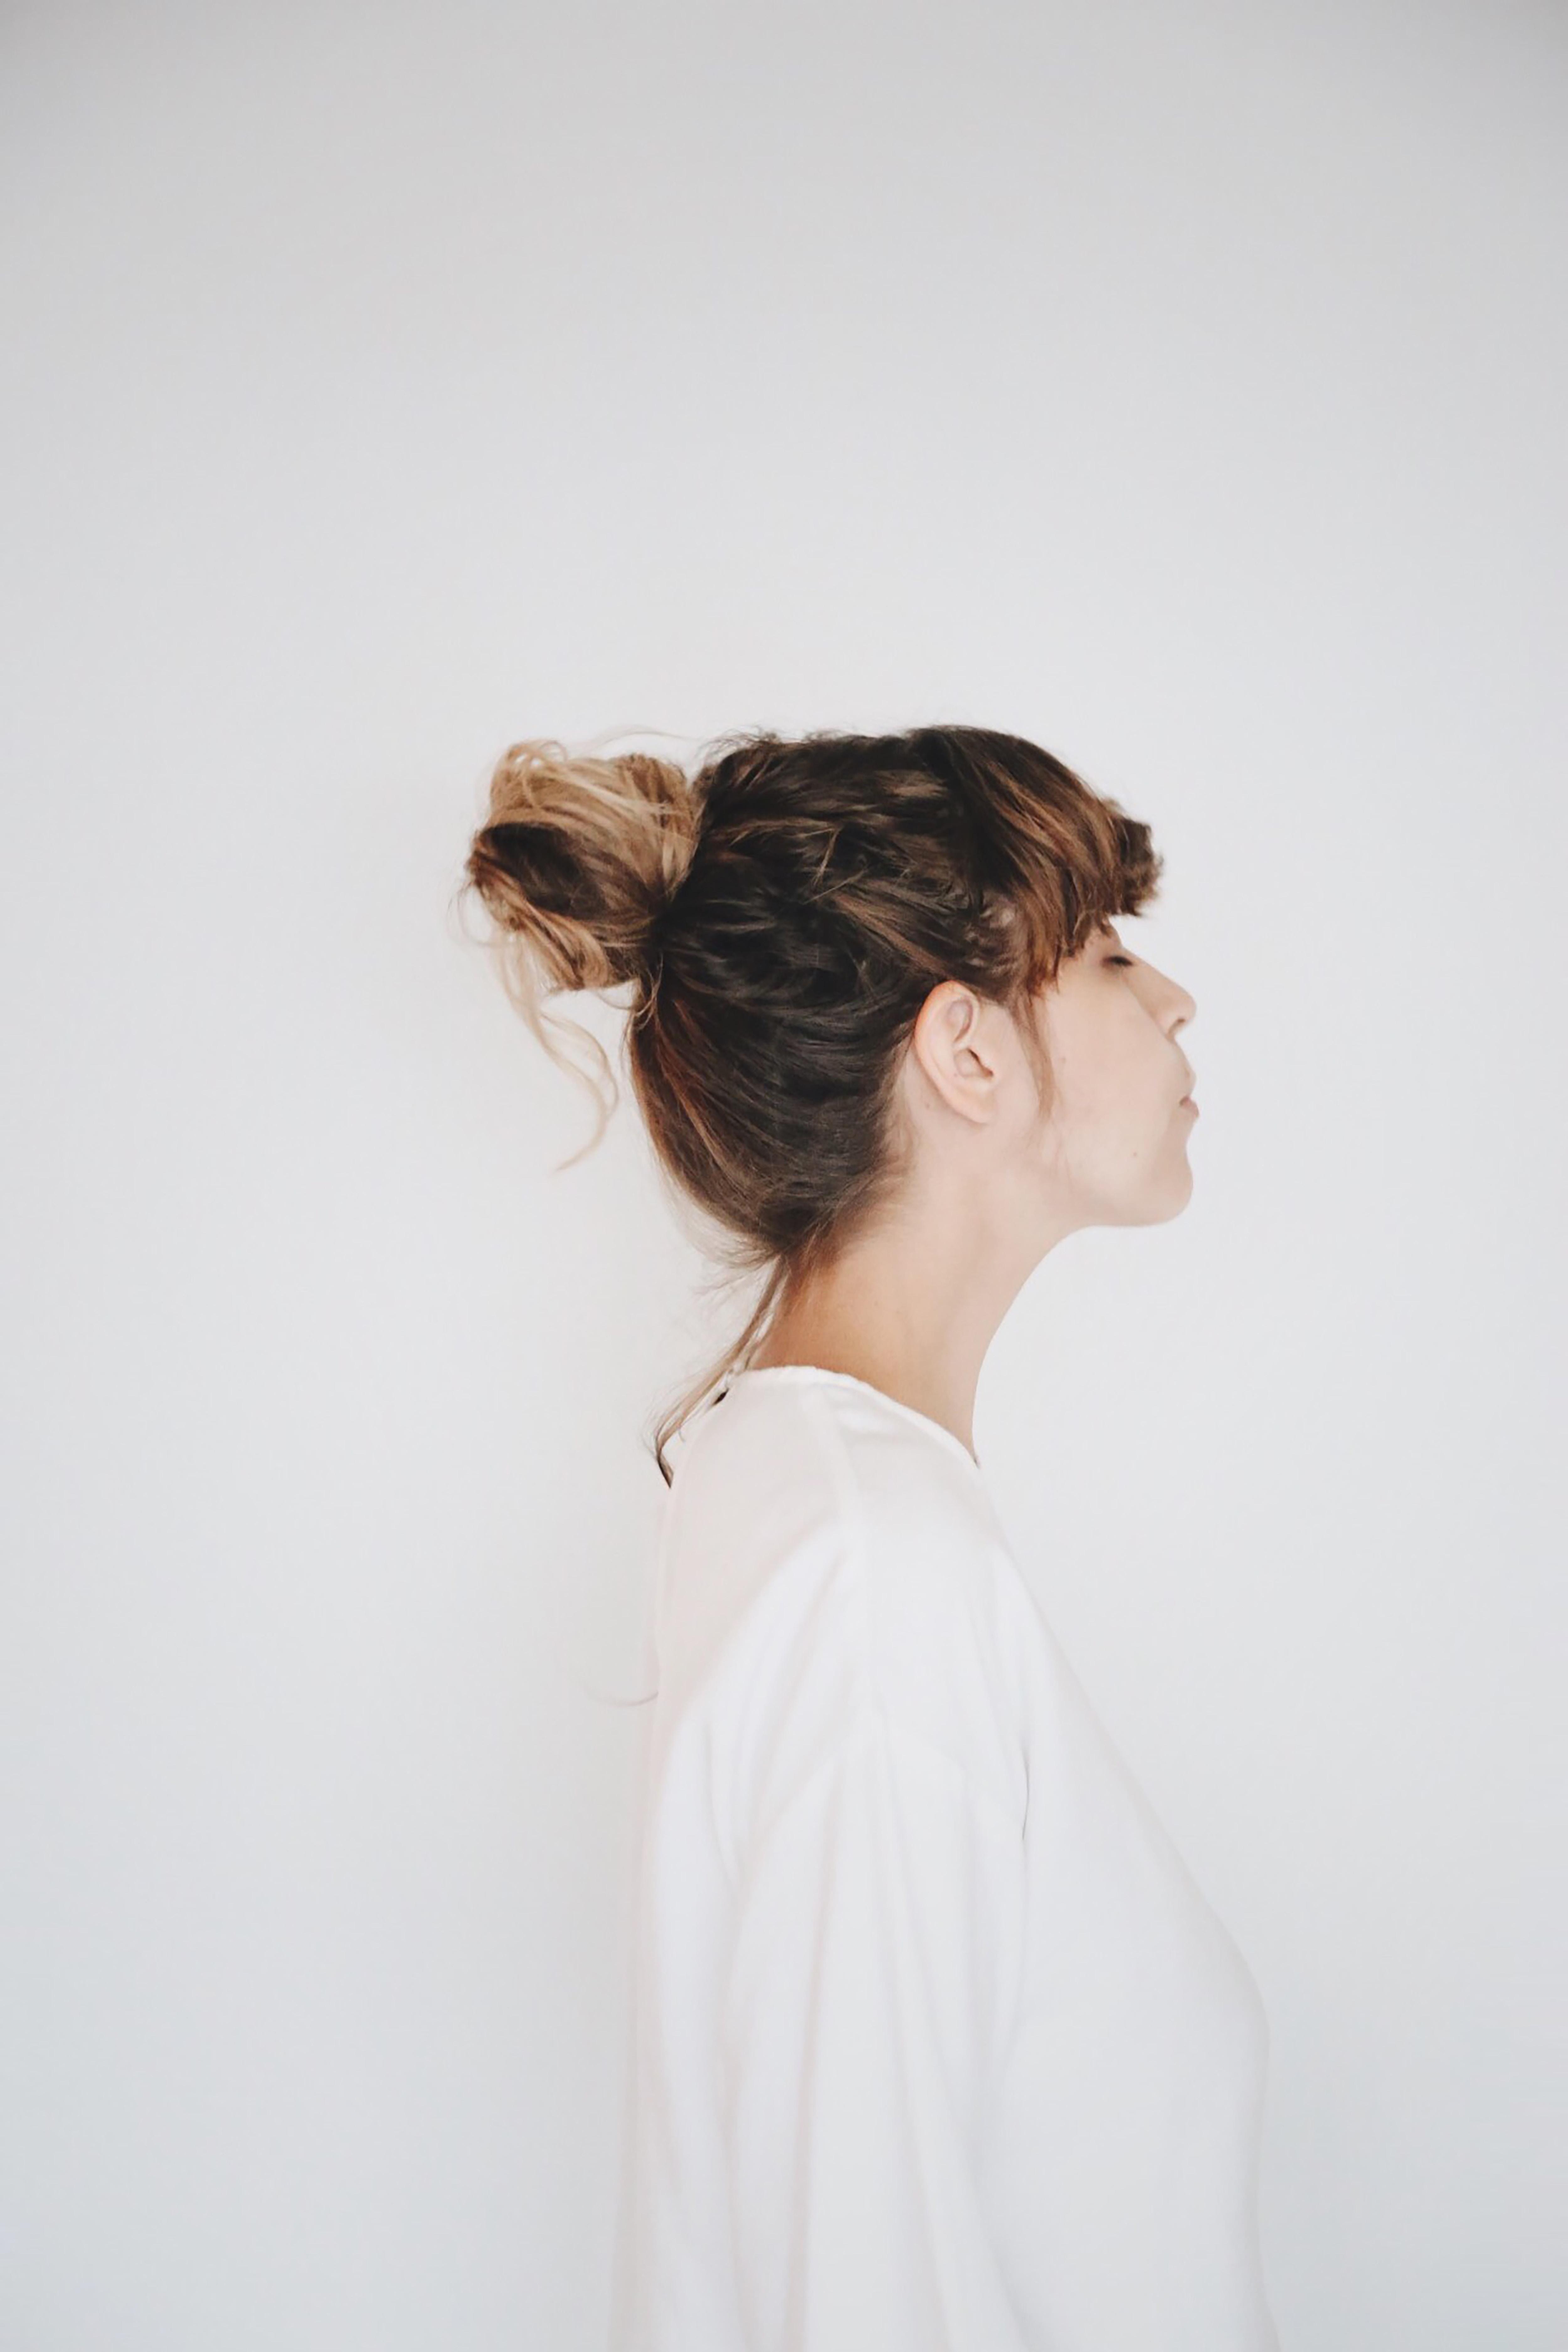 woman beside white wall